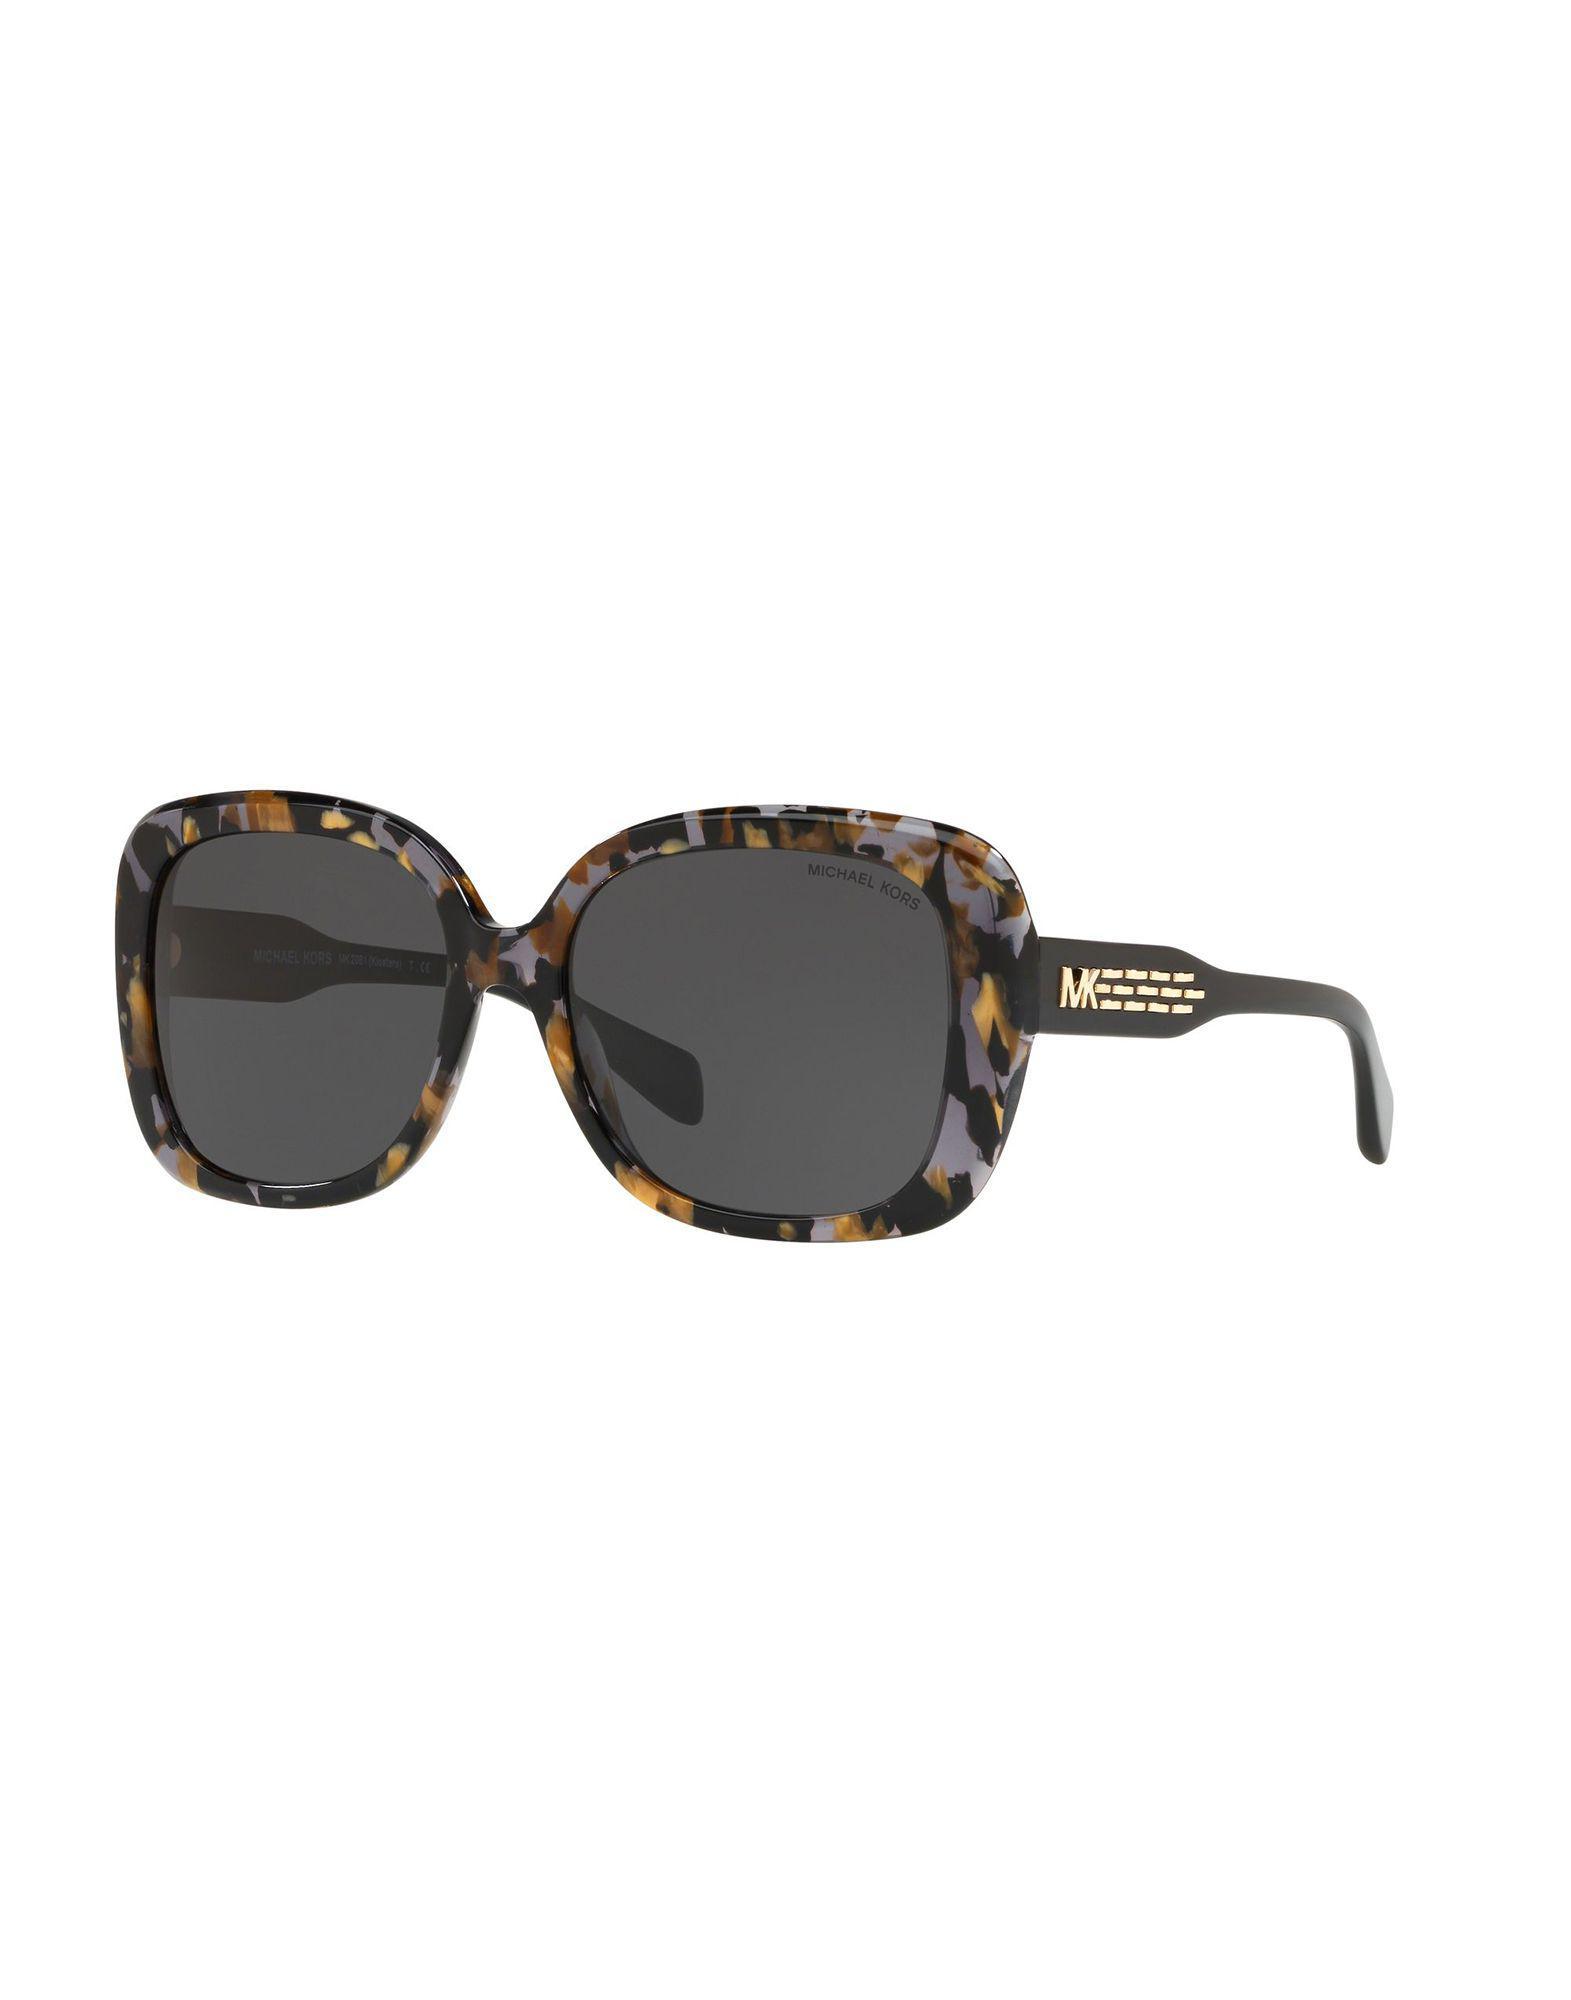 44b83153e4 Michael Kors Sunglasses in Black - Lyst